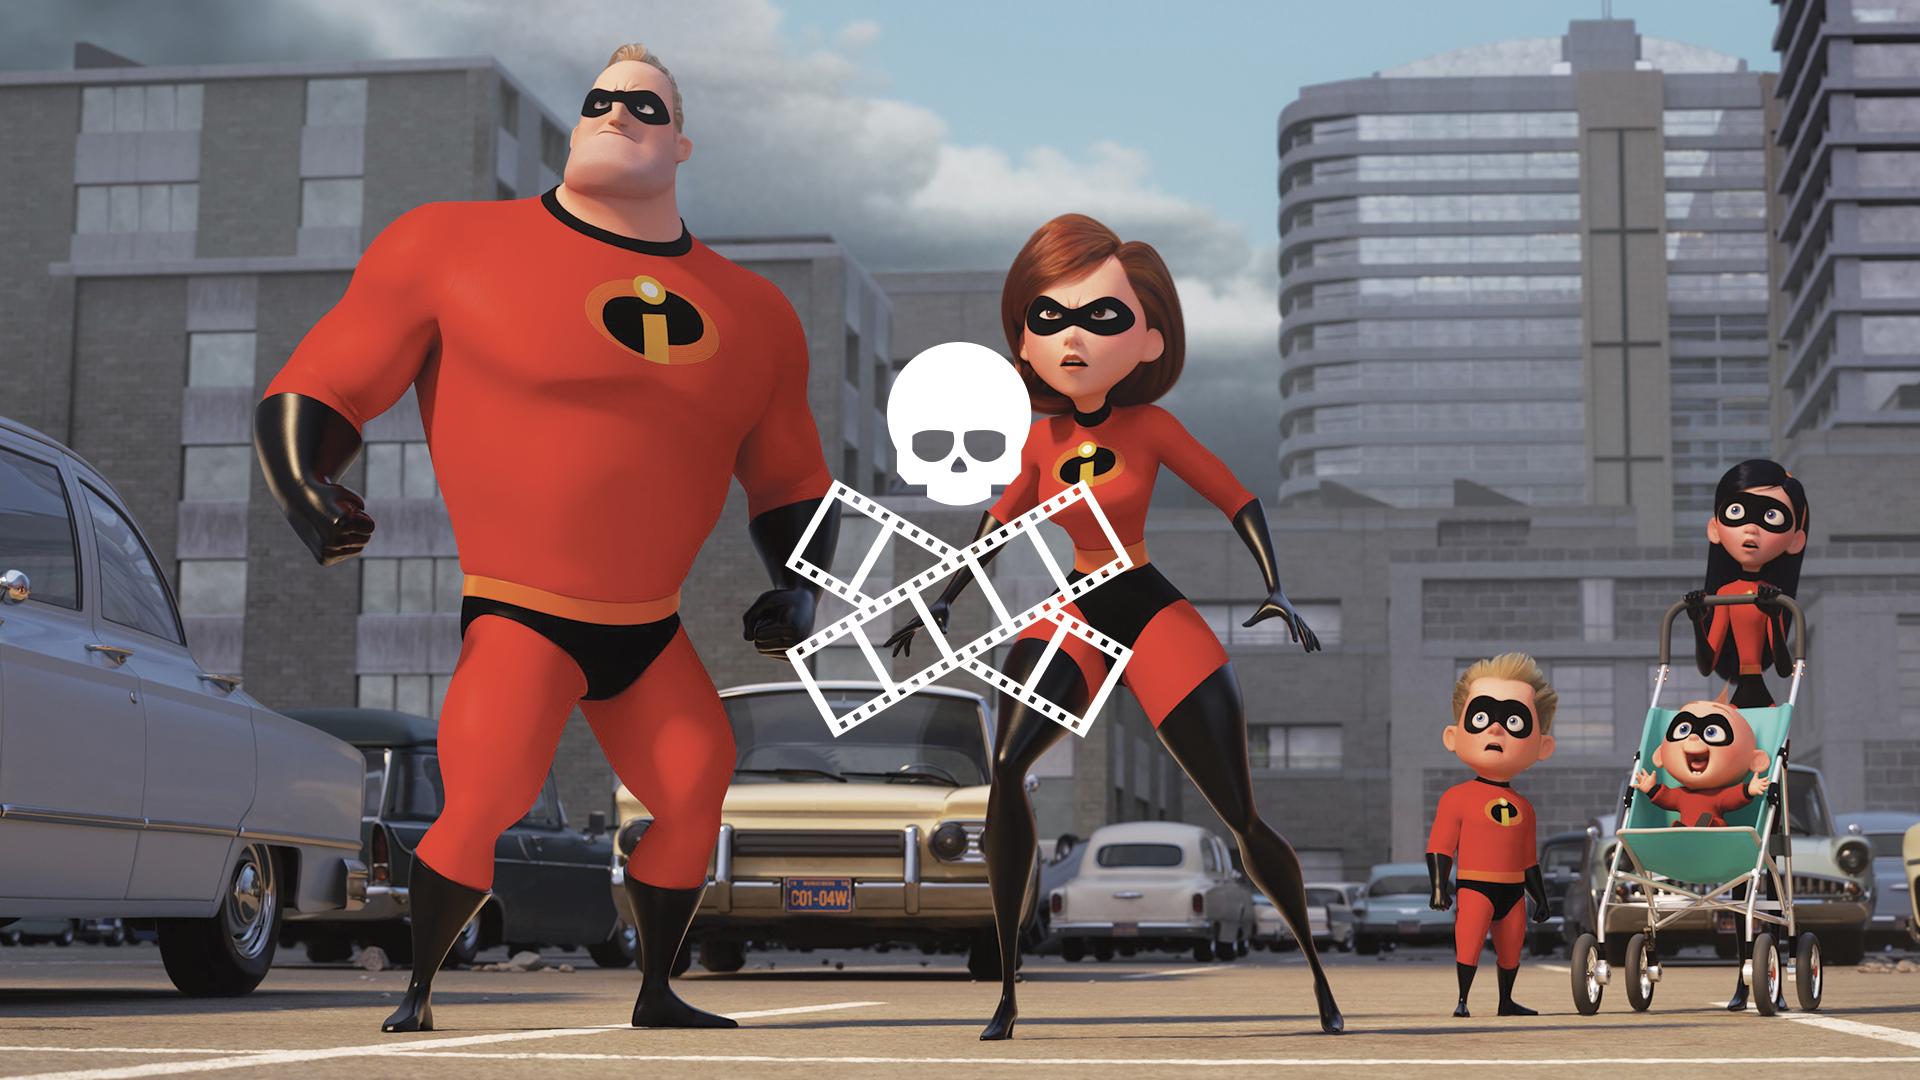 129. Incredibles 2